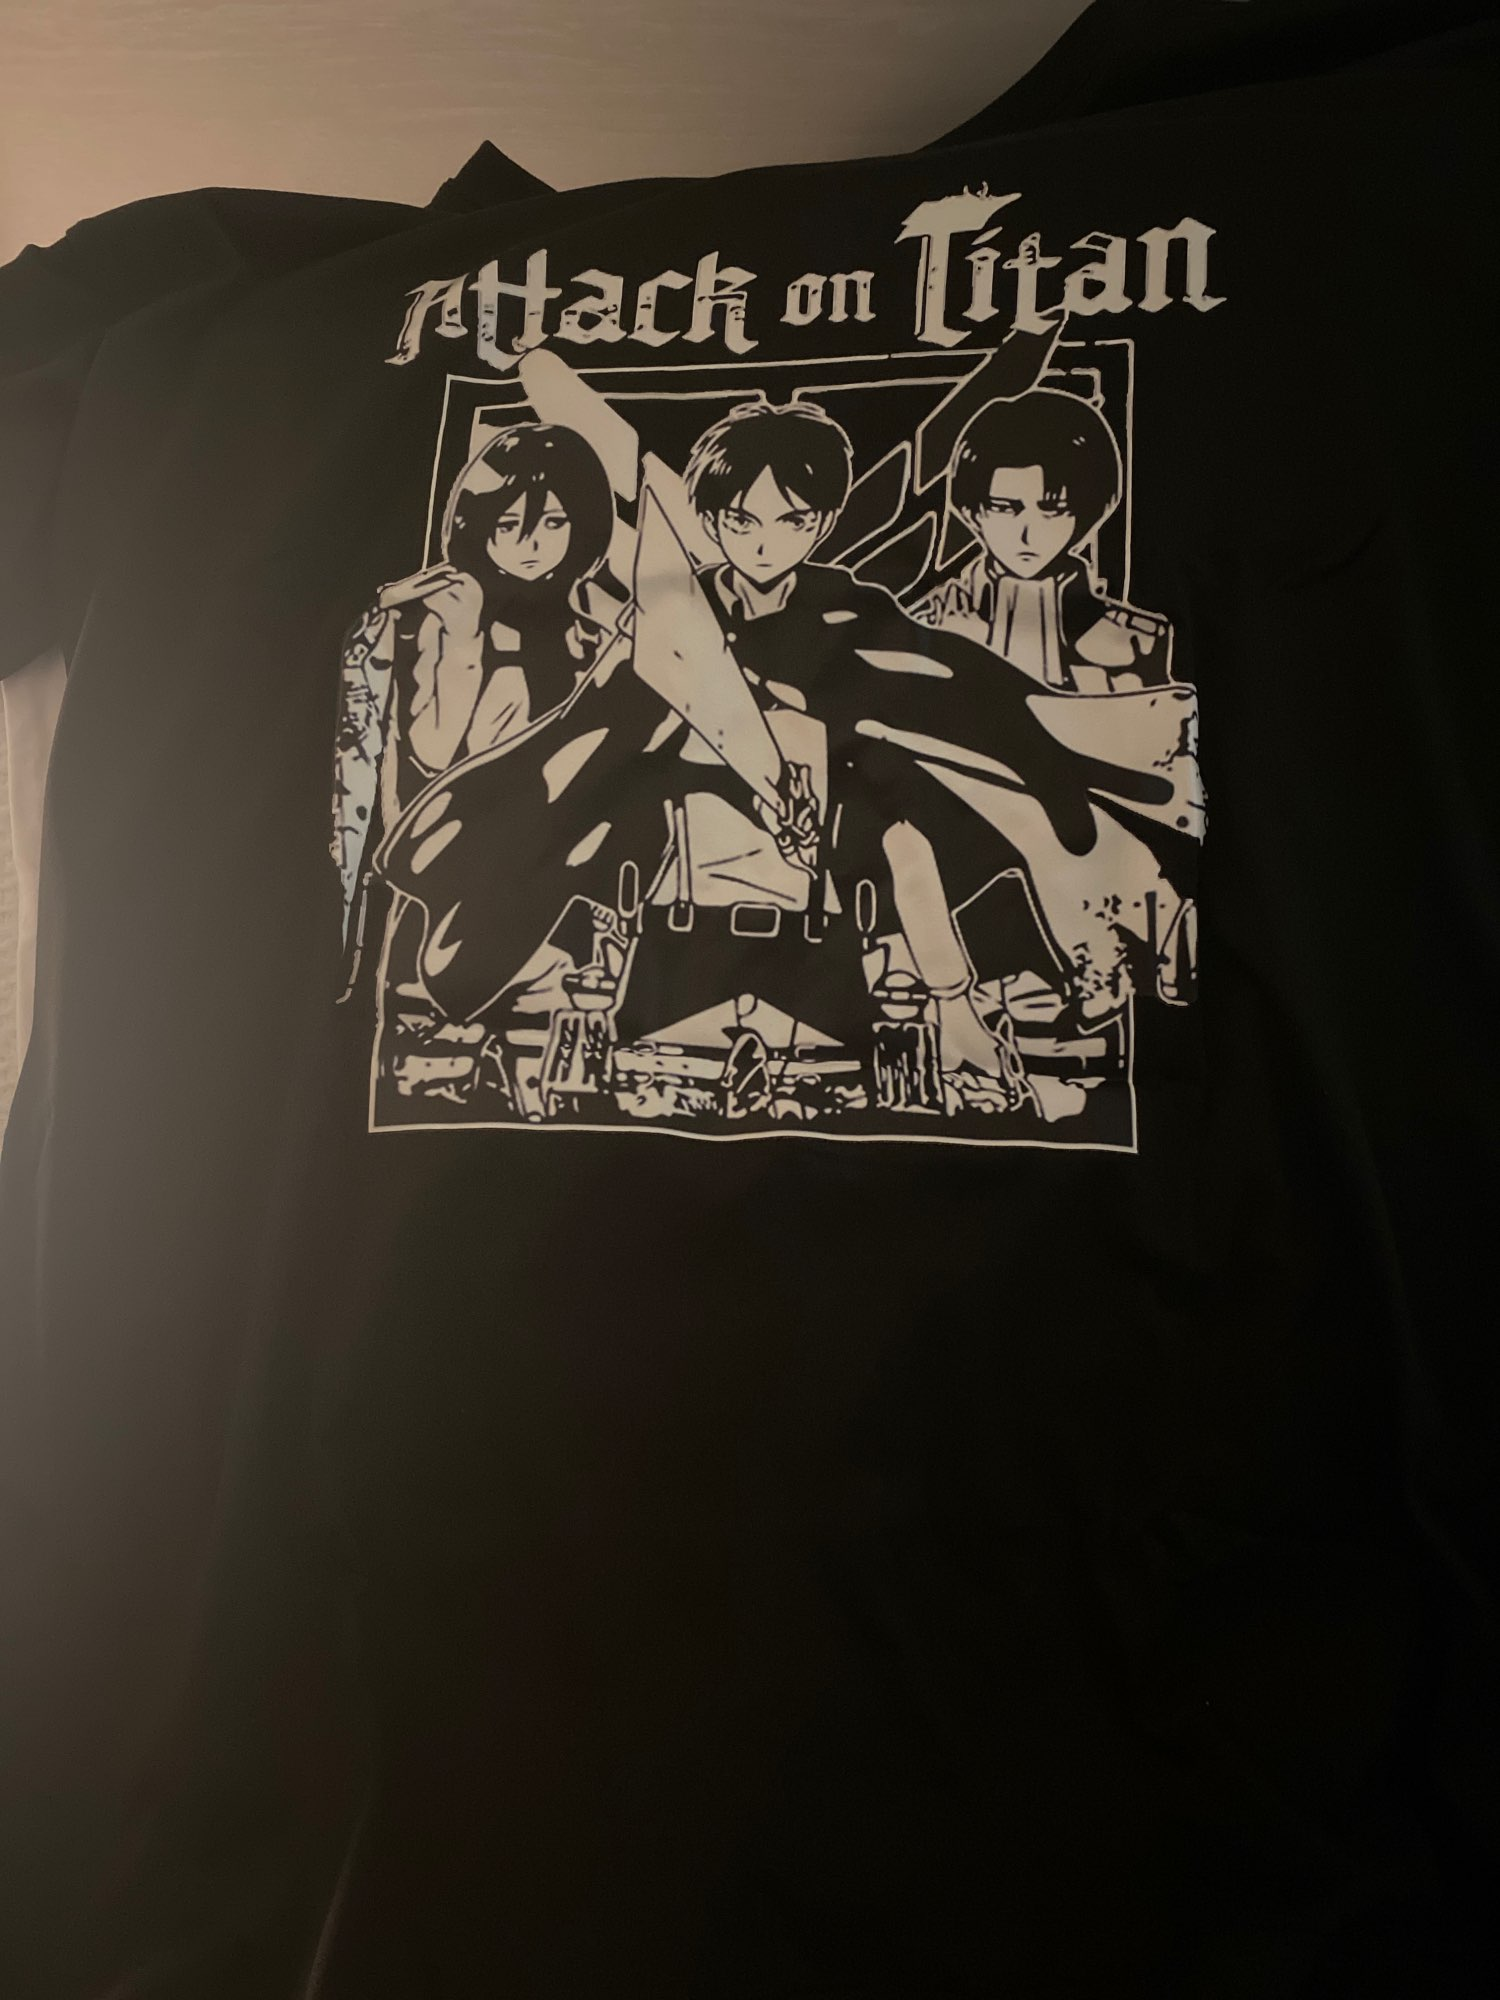 Attack on Titan AOT T-Shirt Men women T Shirt Anime Ackerman Levi Clothes Anime Tops Tees photo review